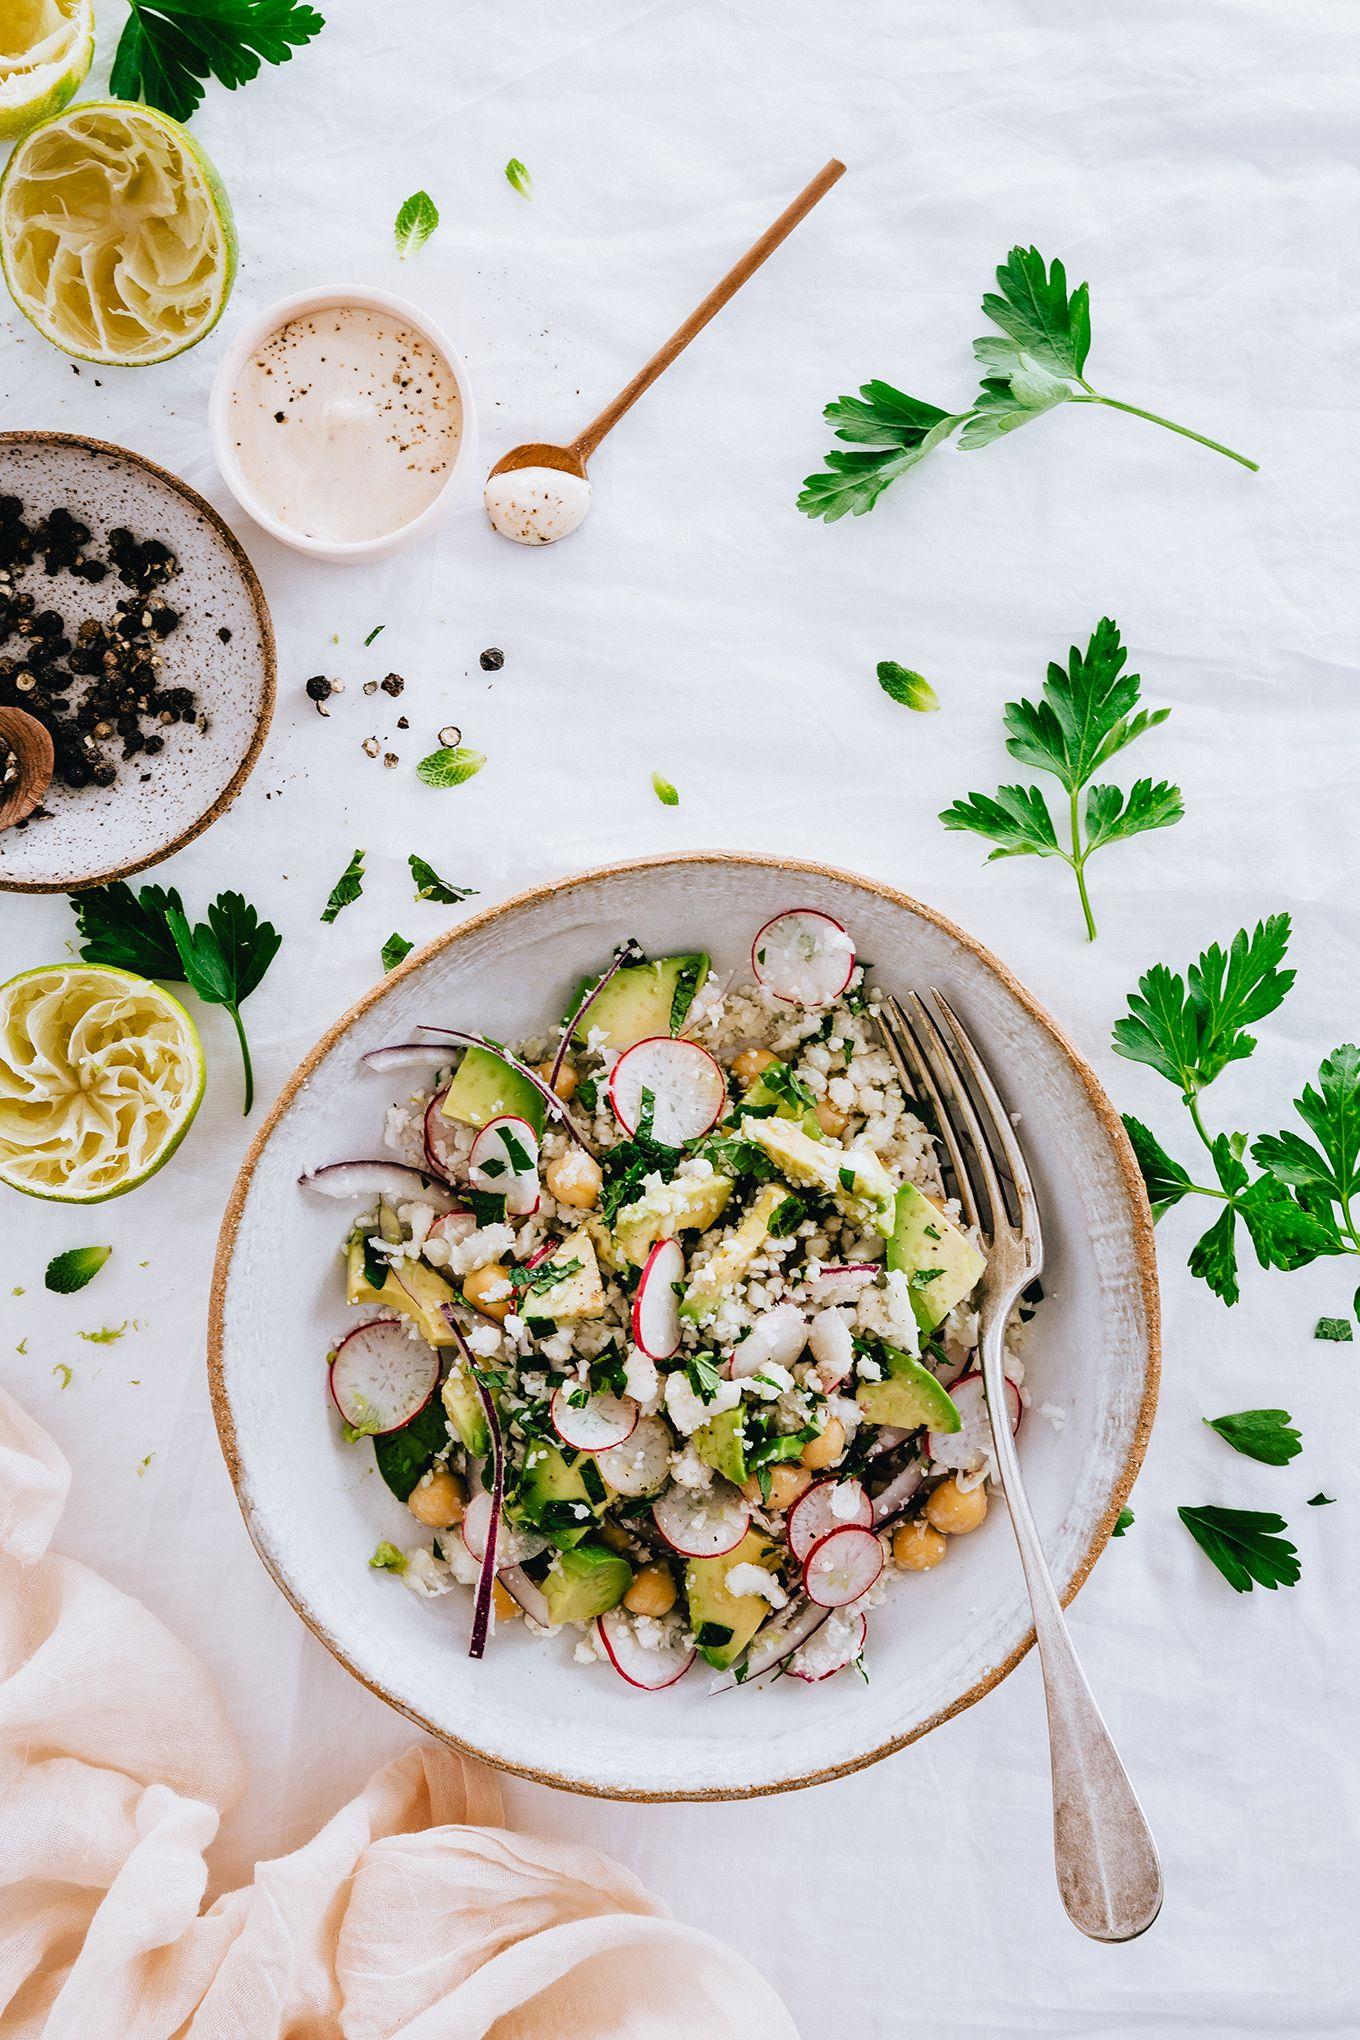 Salade de chou-fleur crue   Carnets Parisiens   Salade chou fleur, Salade de chou